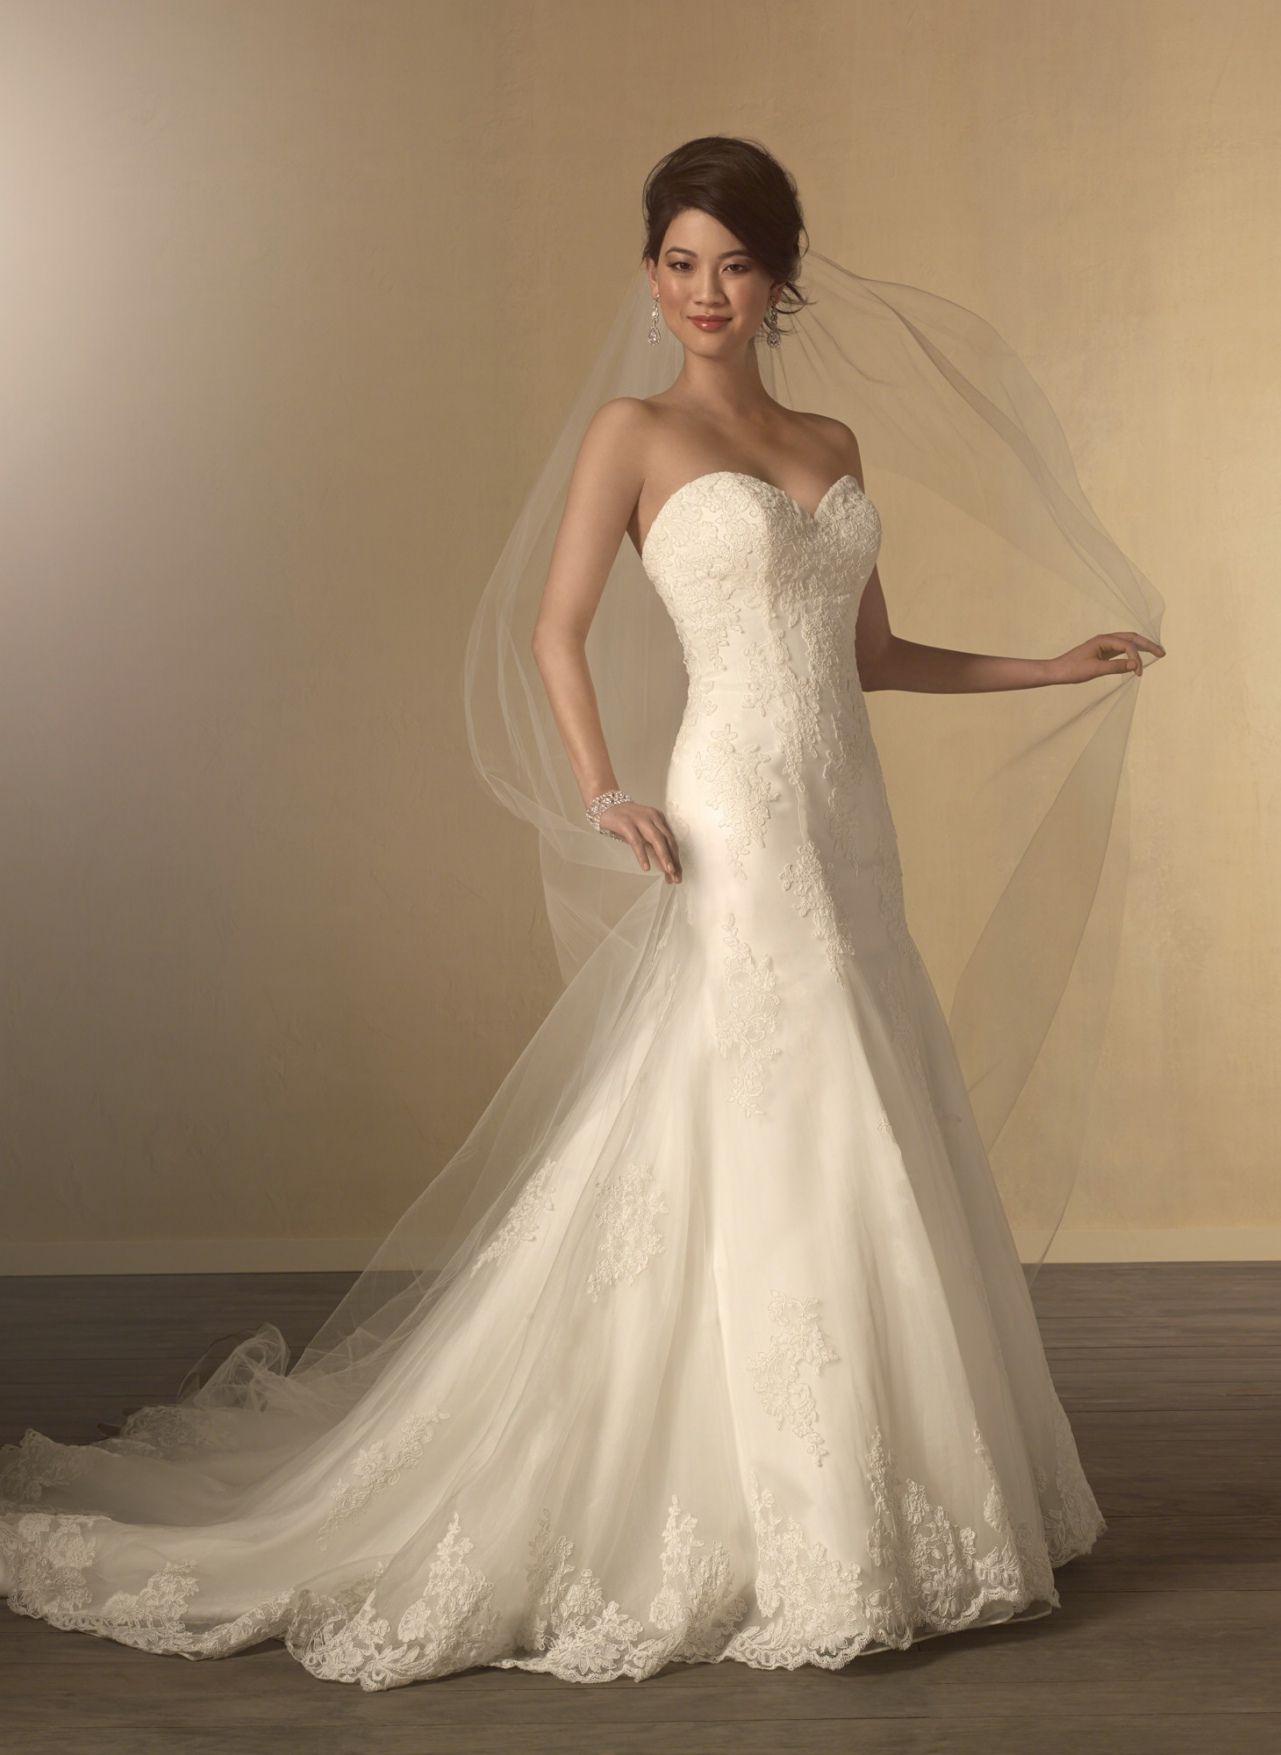 Womens dresses wedding guest   Angelo Wedding Dresses Sale  Womenus Dresses for Wedding Guest